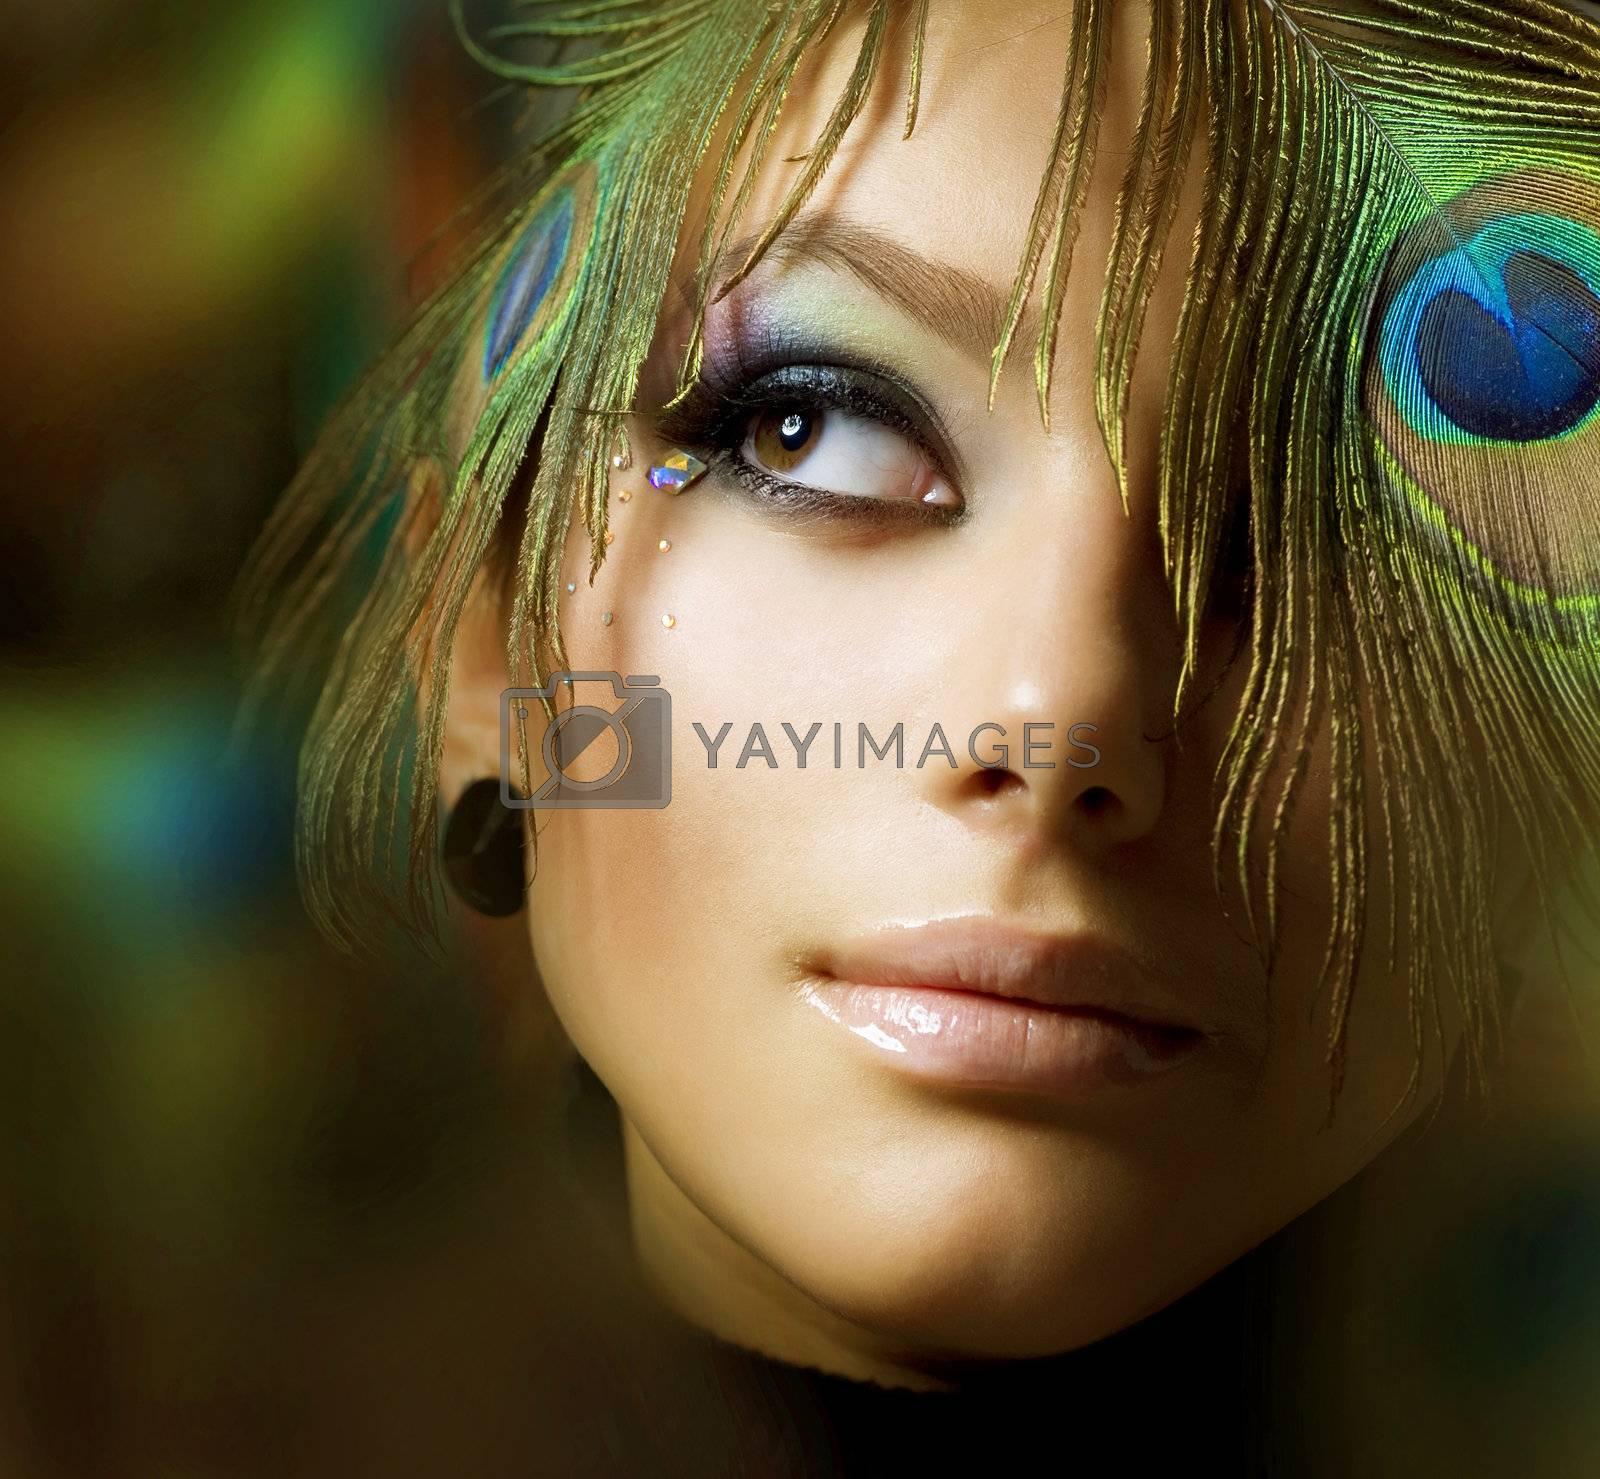 Beautiful Fashion Girl face. Peacock Makeup